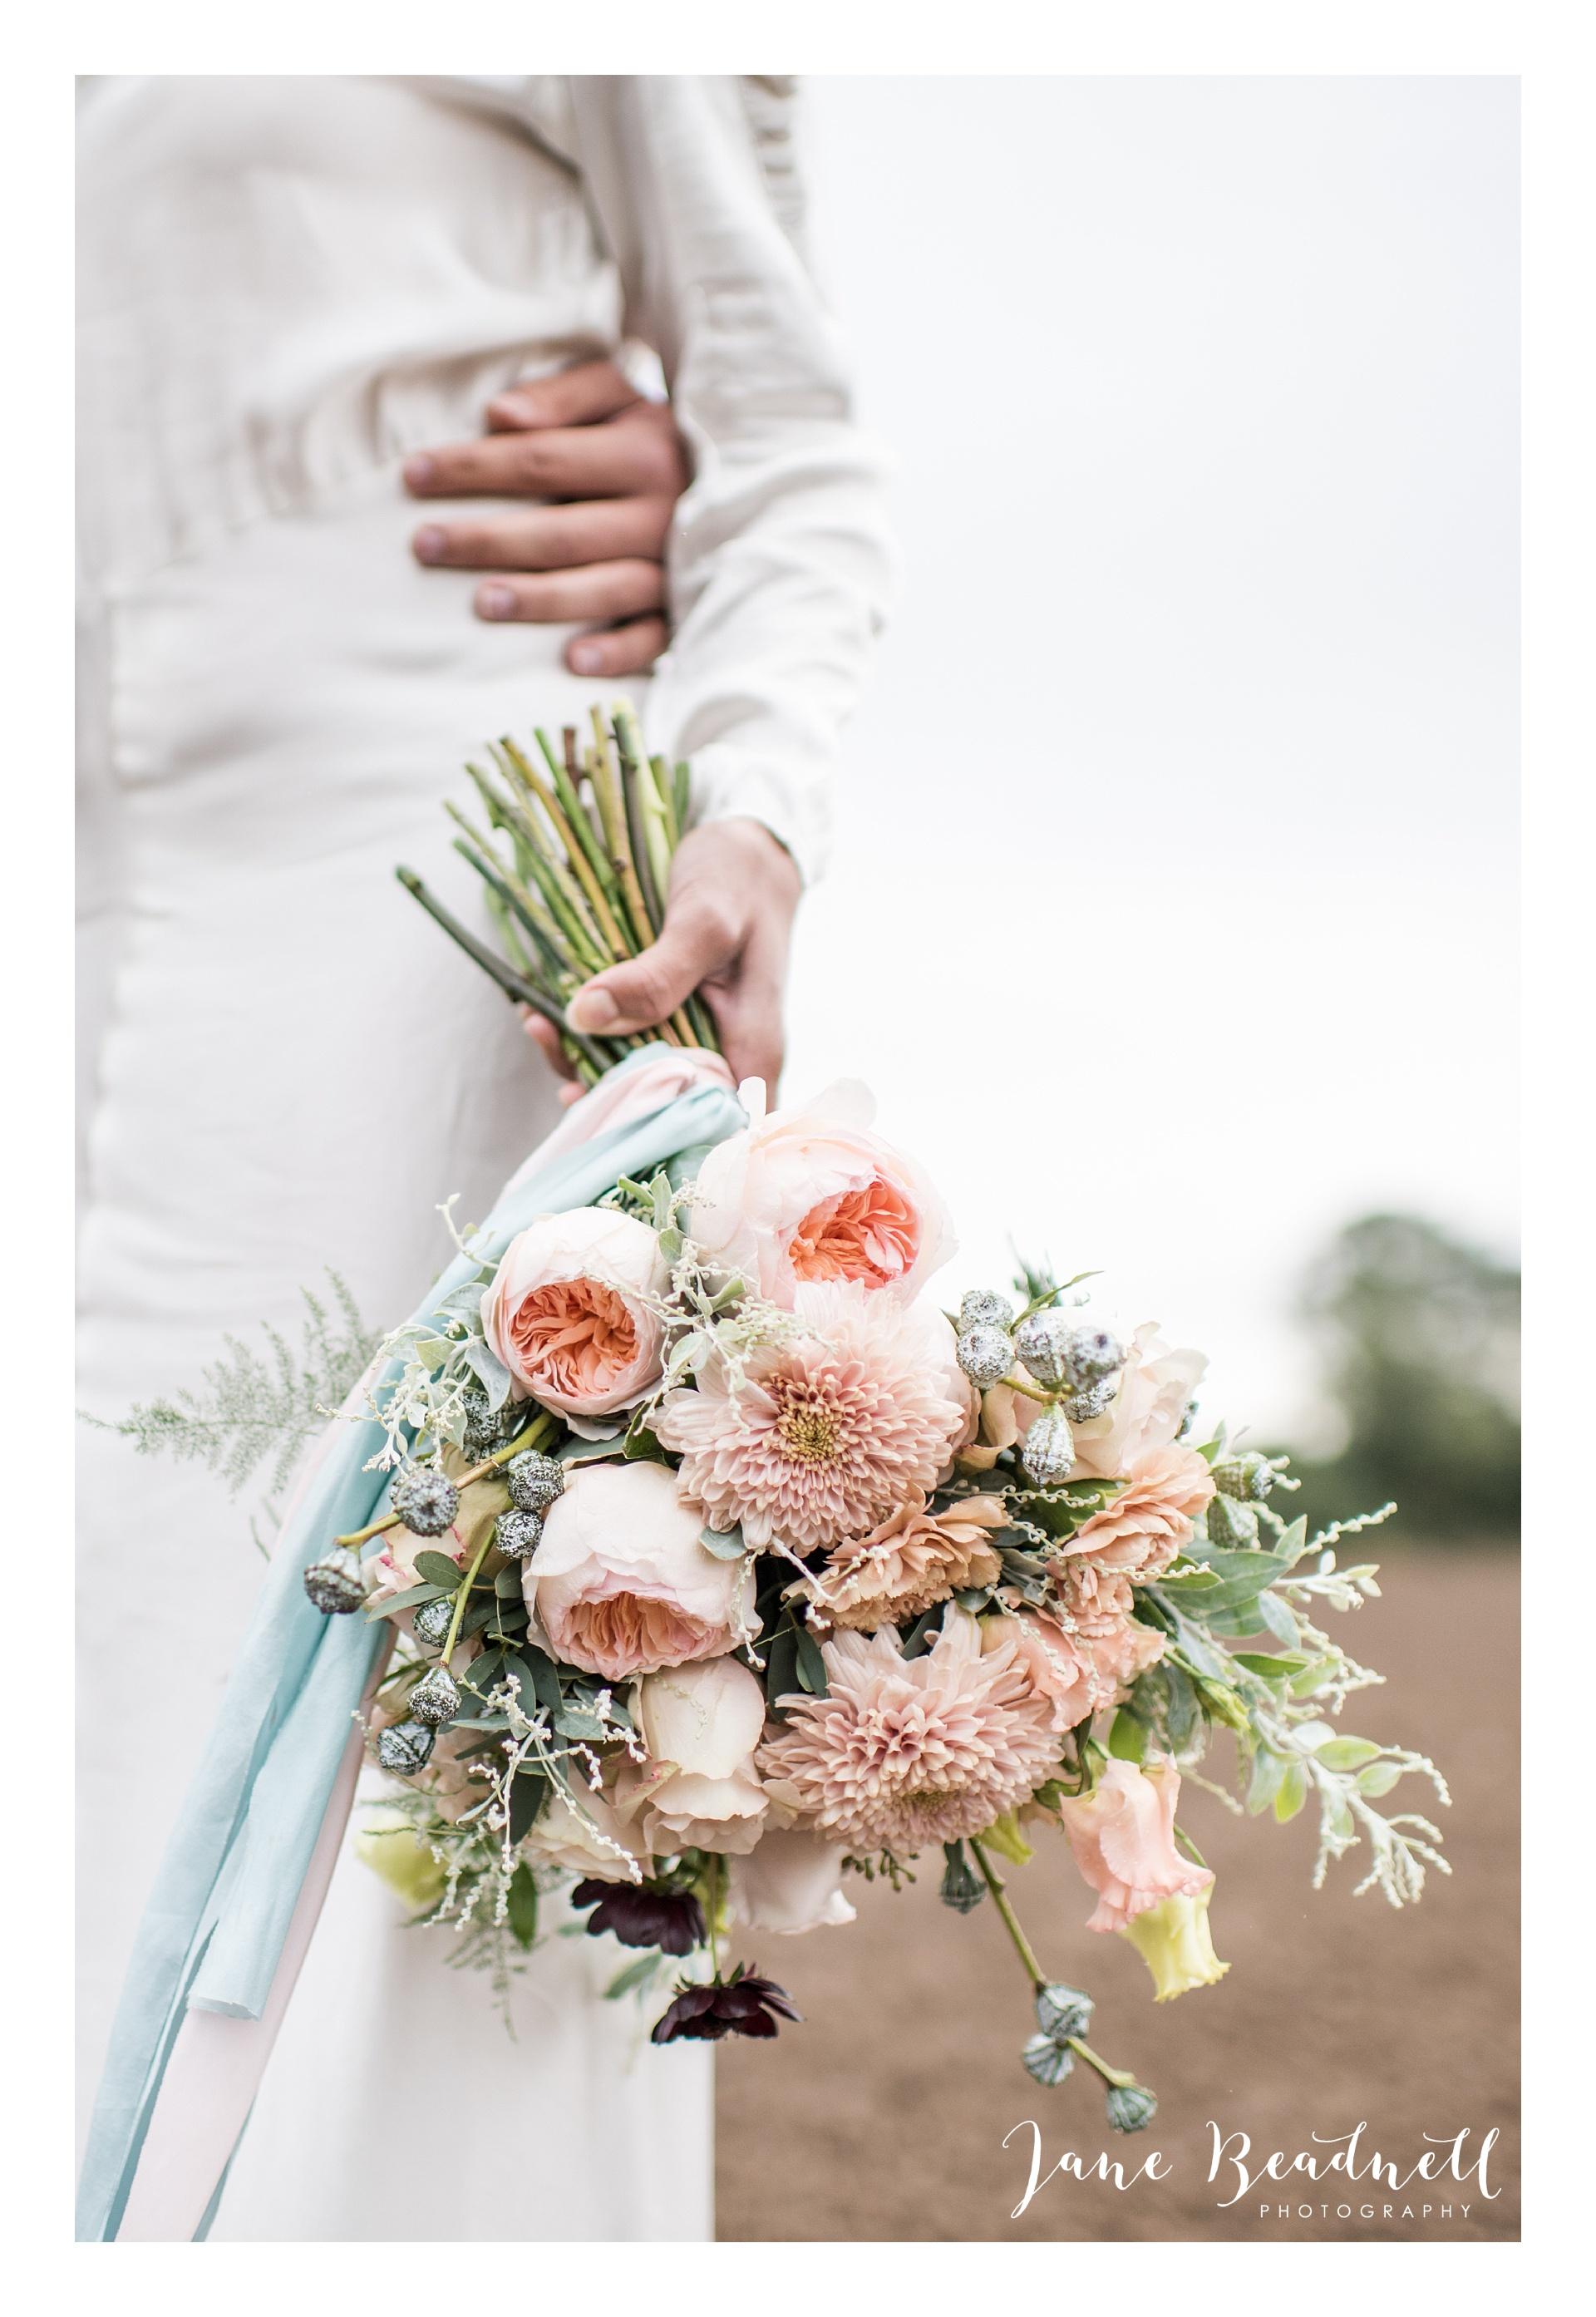 fine-art-wedding-photographer-jane-beadnell-photography-yorkshire-wedding-photographer_0016